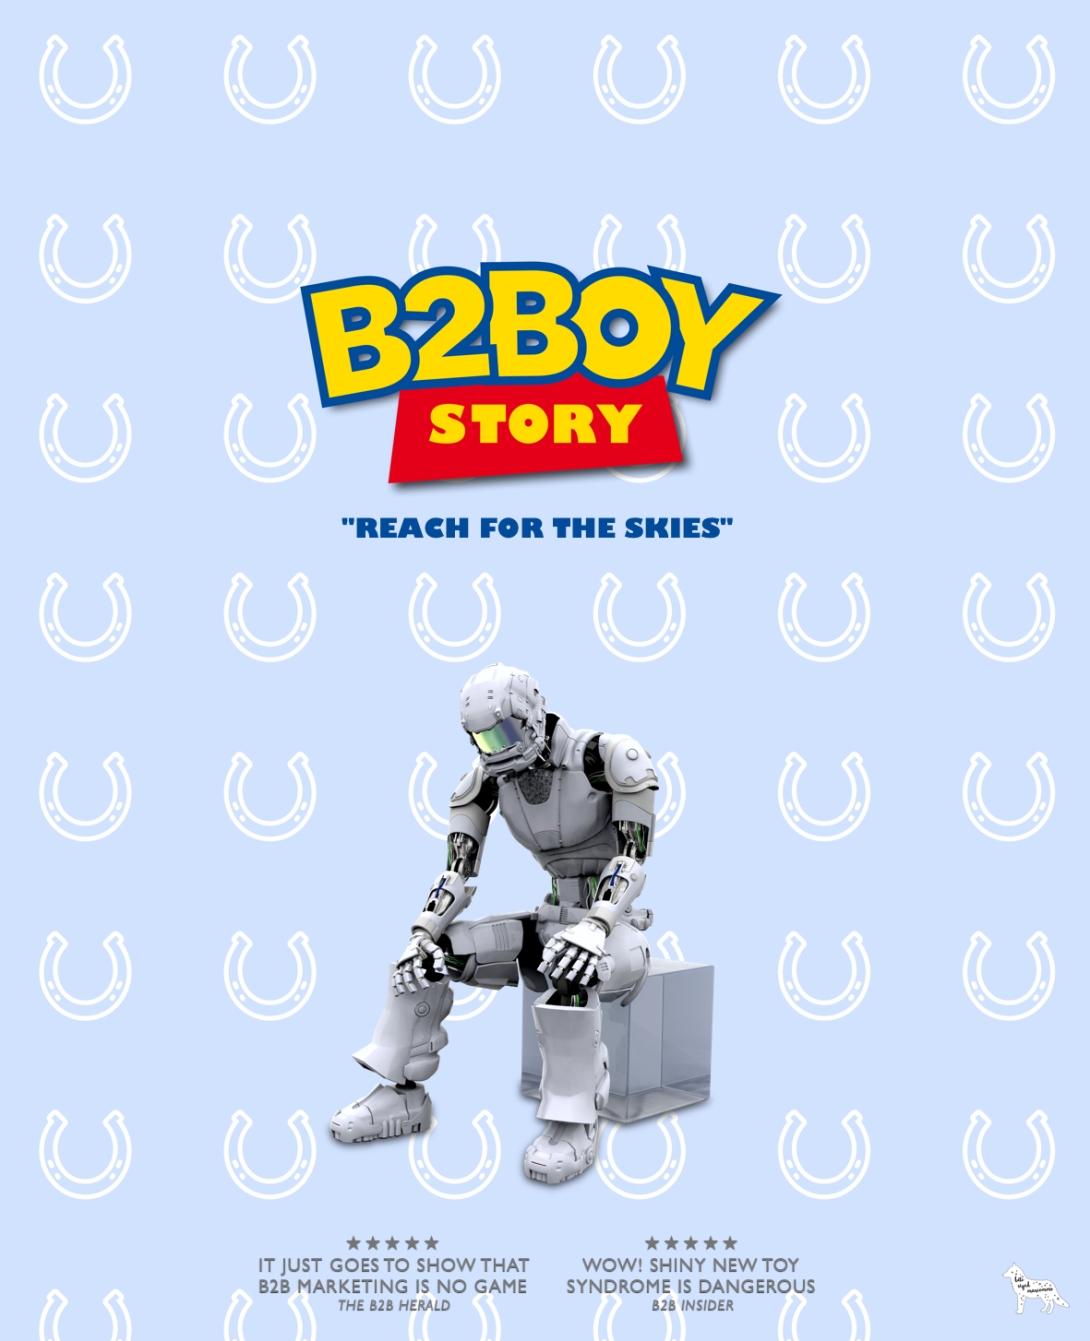 B2B marketing the movie - B2Boy Story